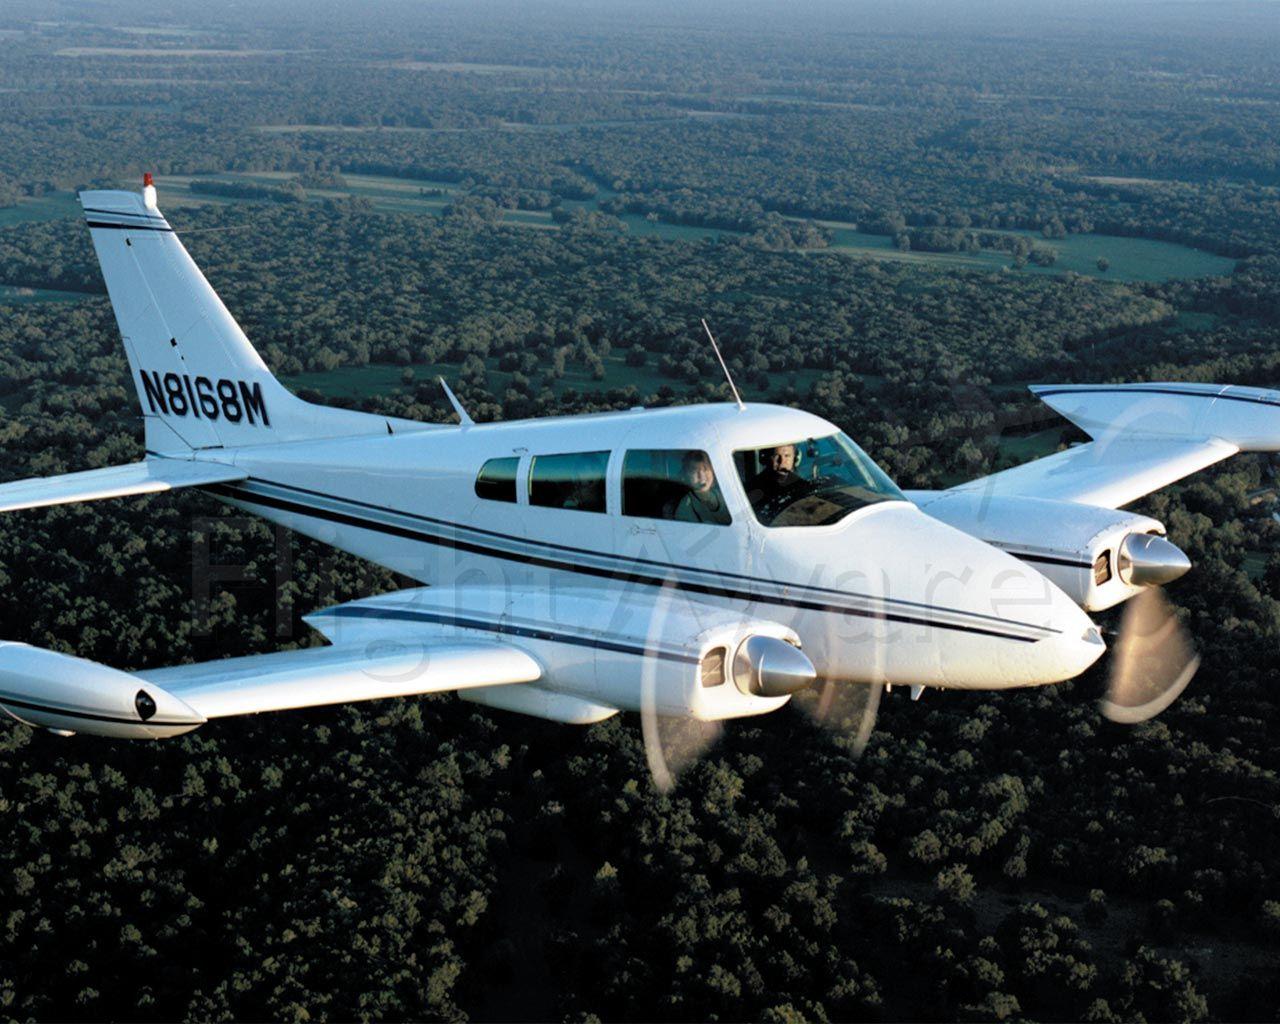 Cessna 310 (N8168M)